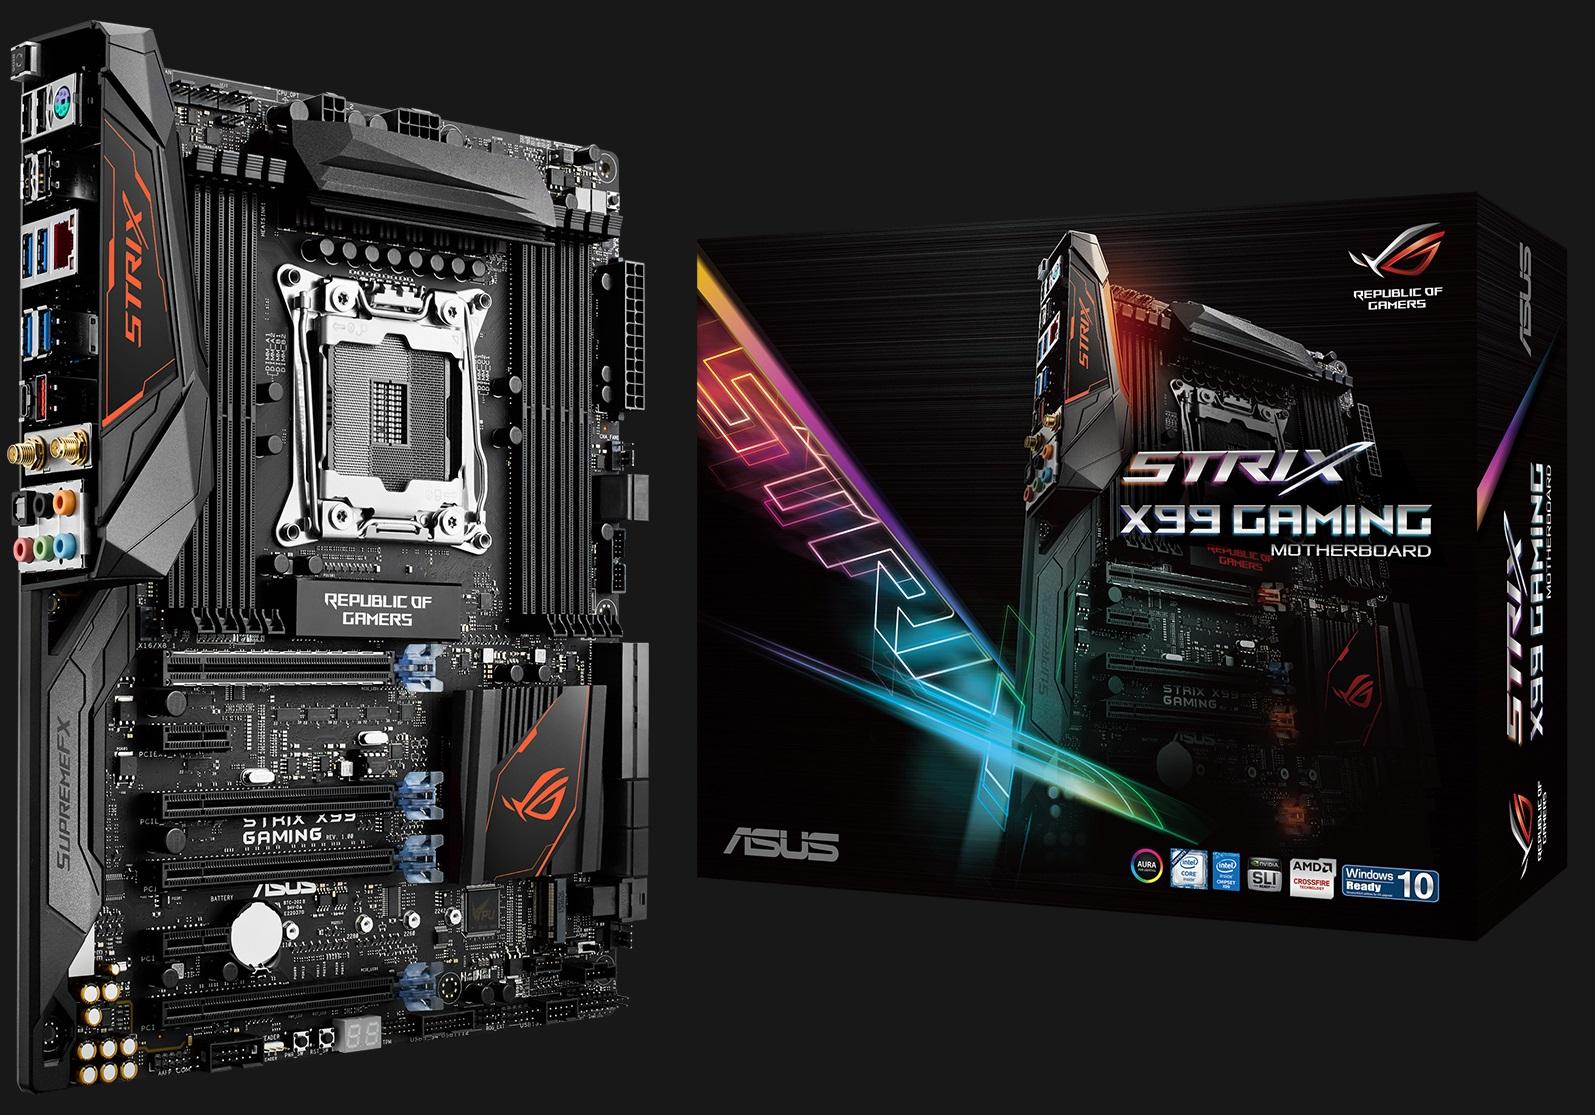 Mainboard ASUS STRIX X99 Gaming - LGA 2011